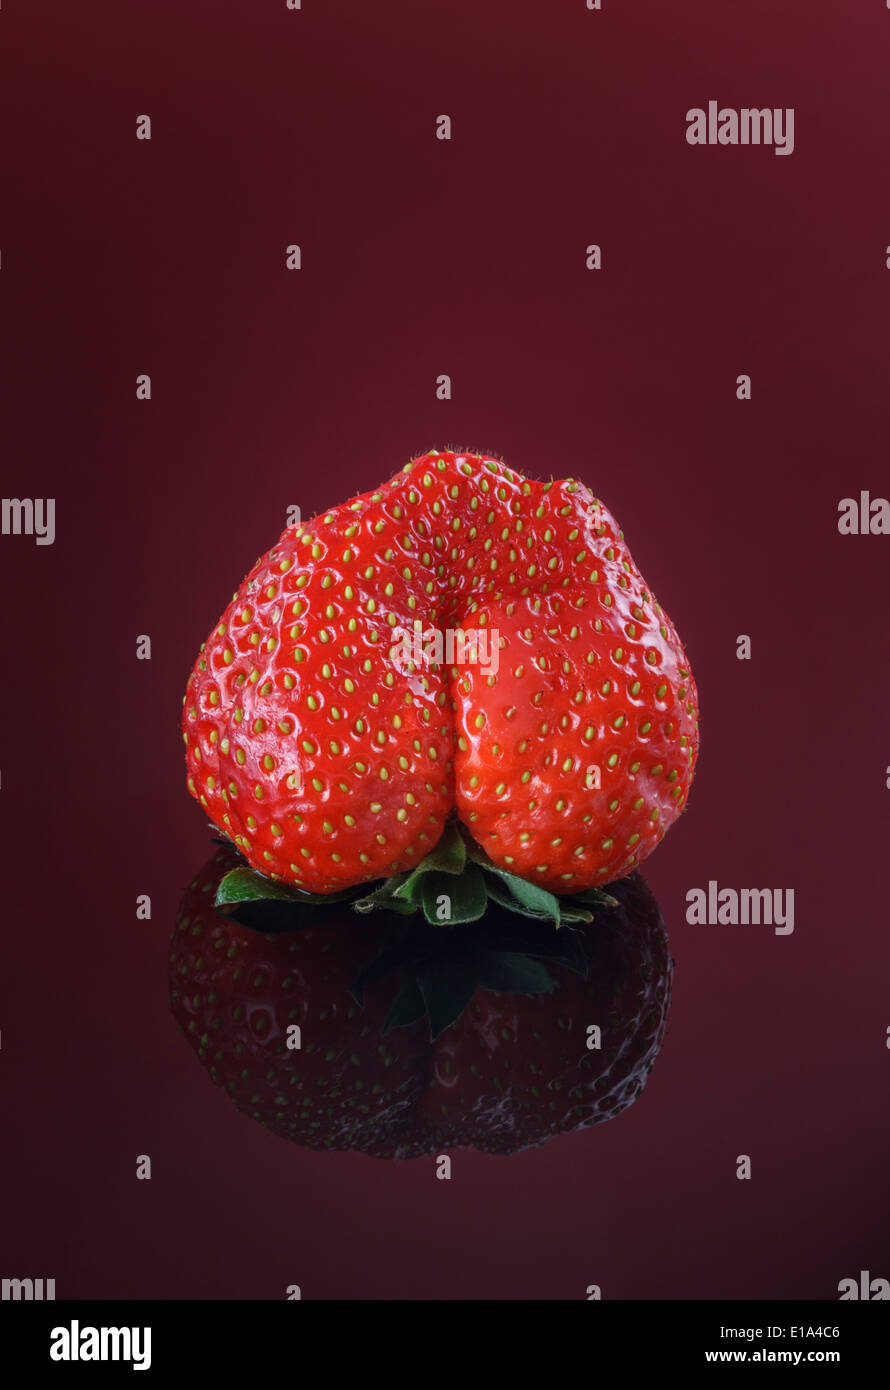 Solo fresas frescas sobre fondo rojo. Imagen De Stock